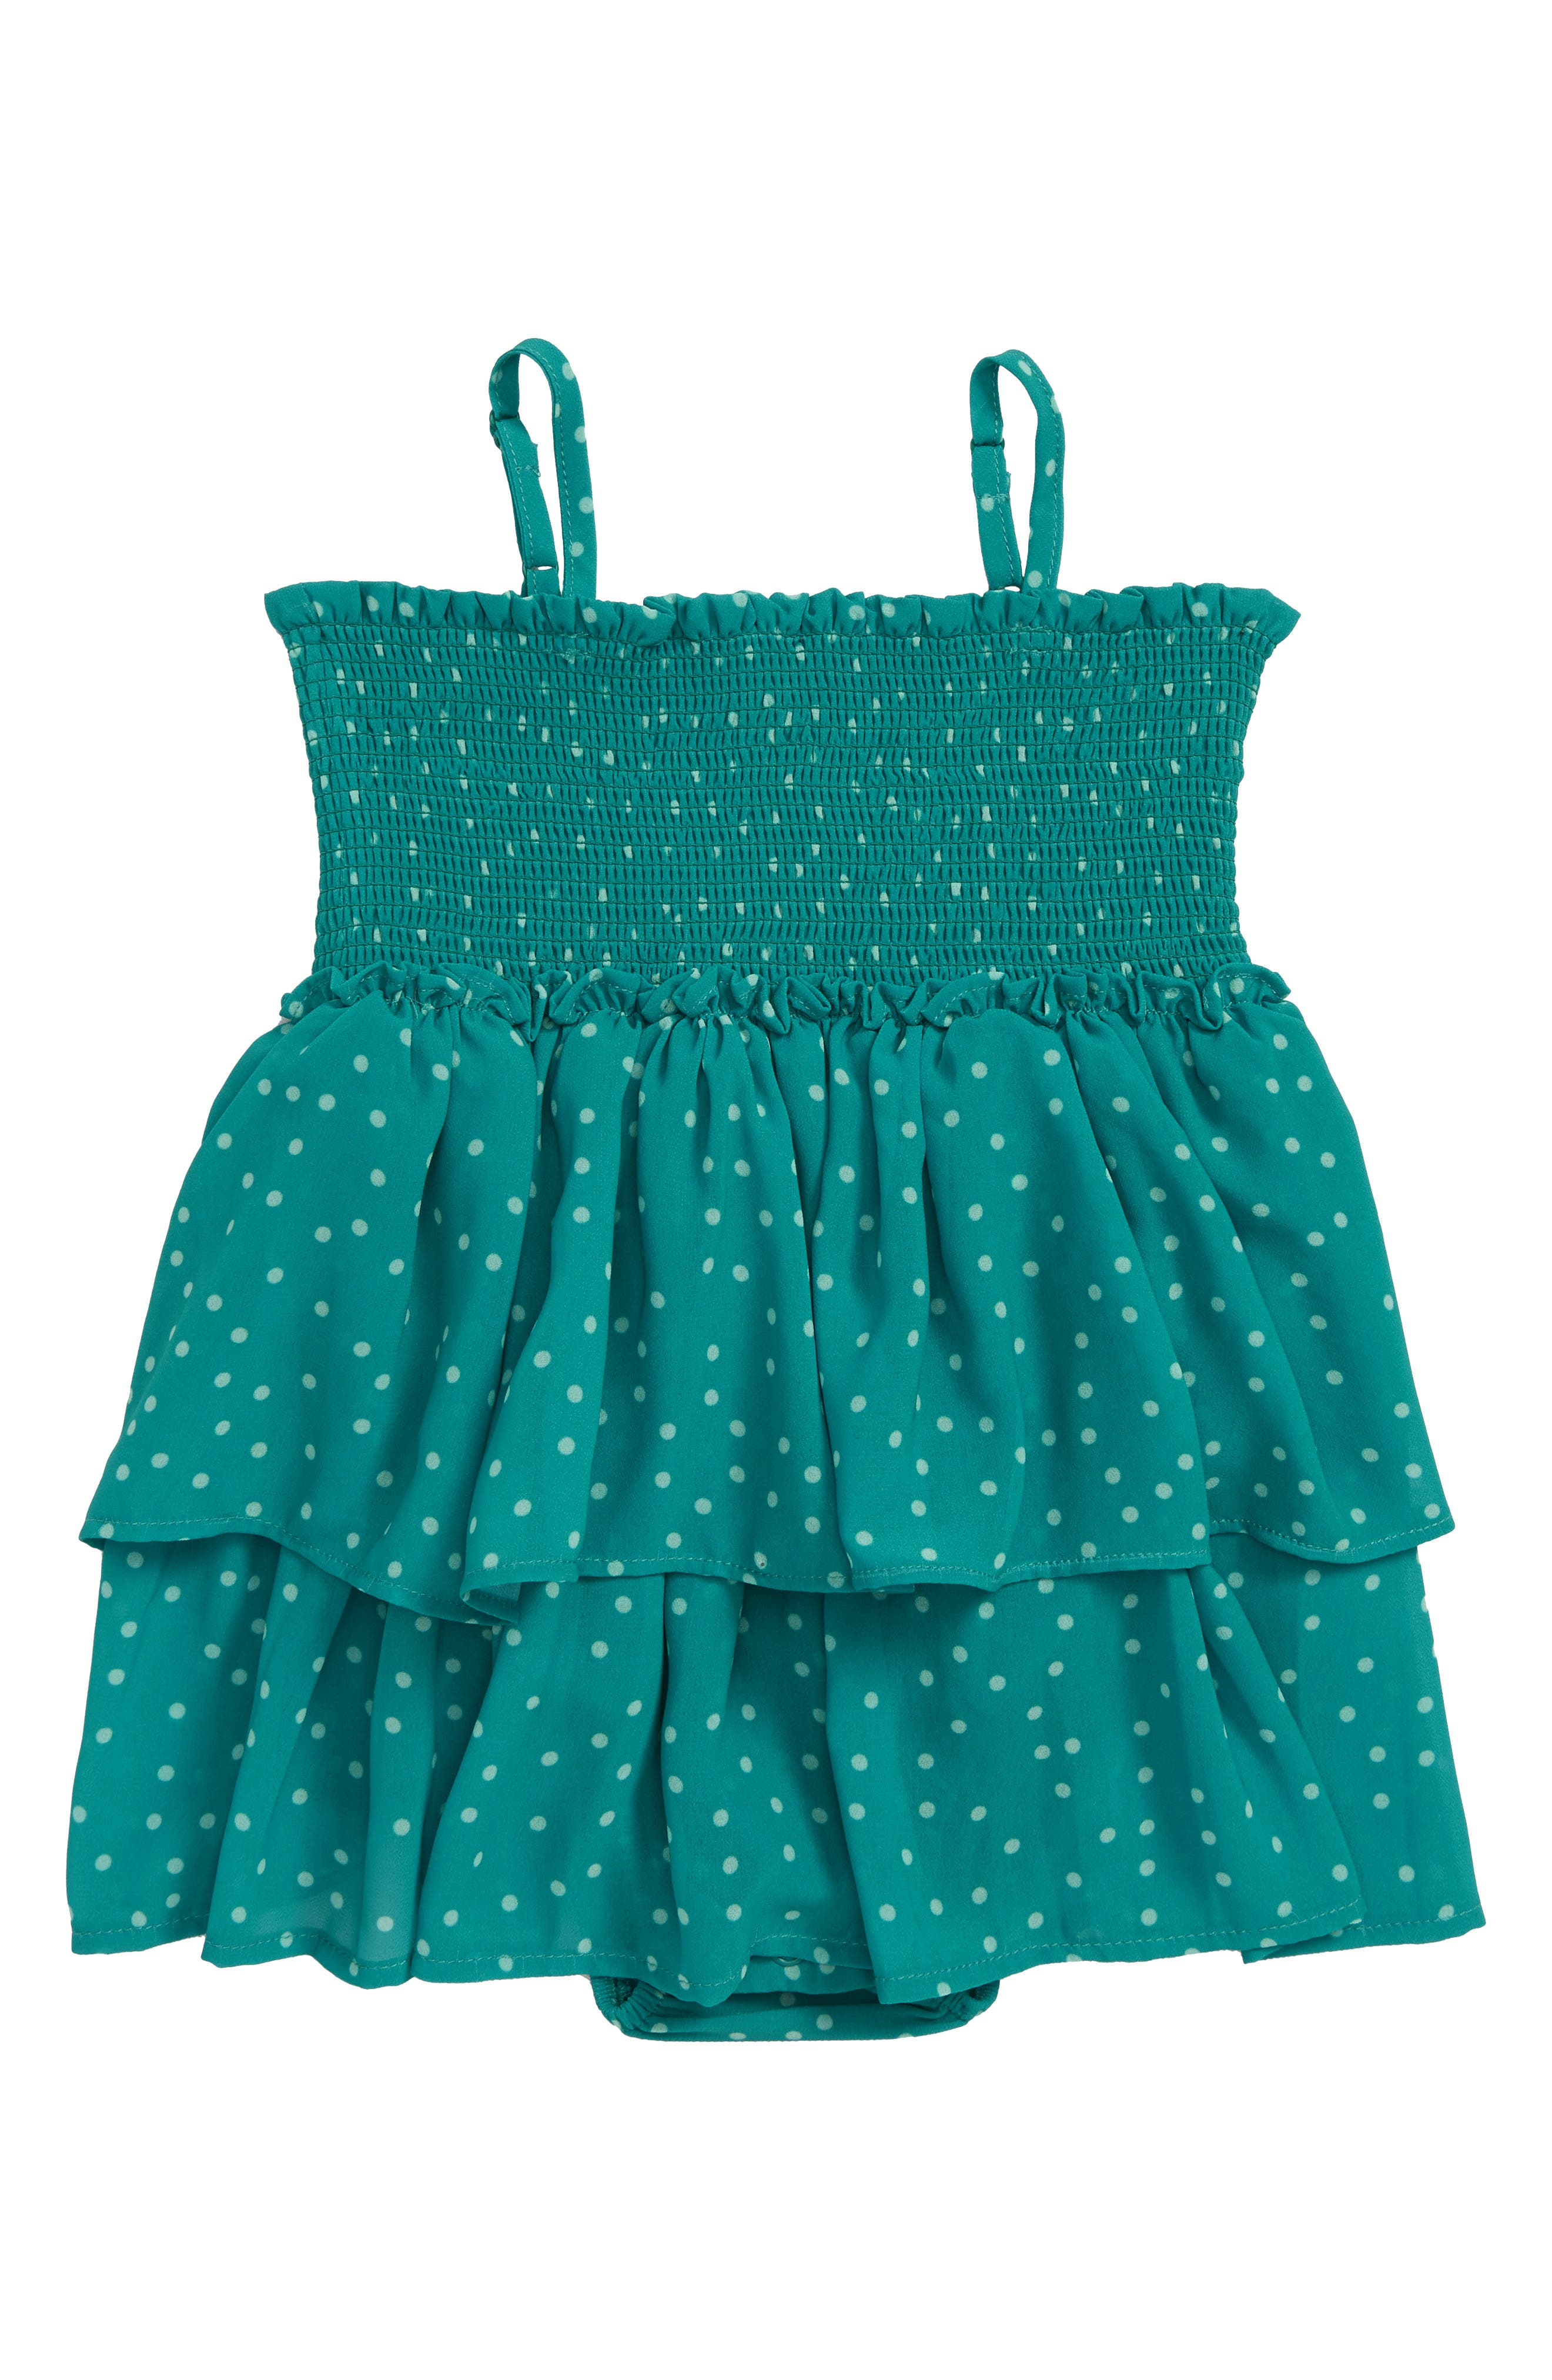 Stace Smocked Polka Dot Dress,                         Main,                         color, Green/ White Spot